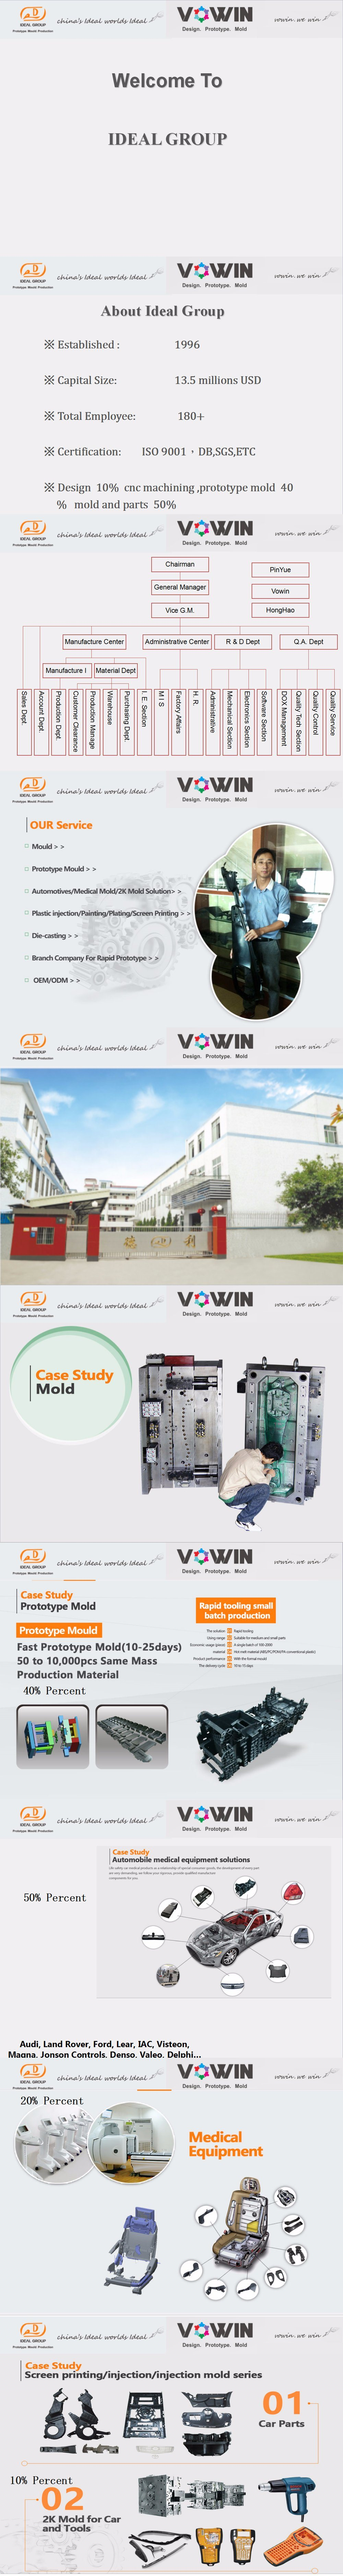 Anodized Aluminum Alloy Rapid Protoyping